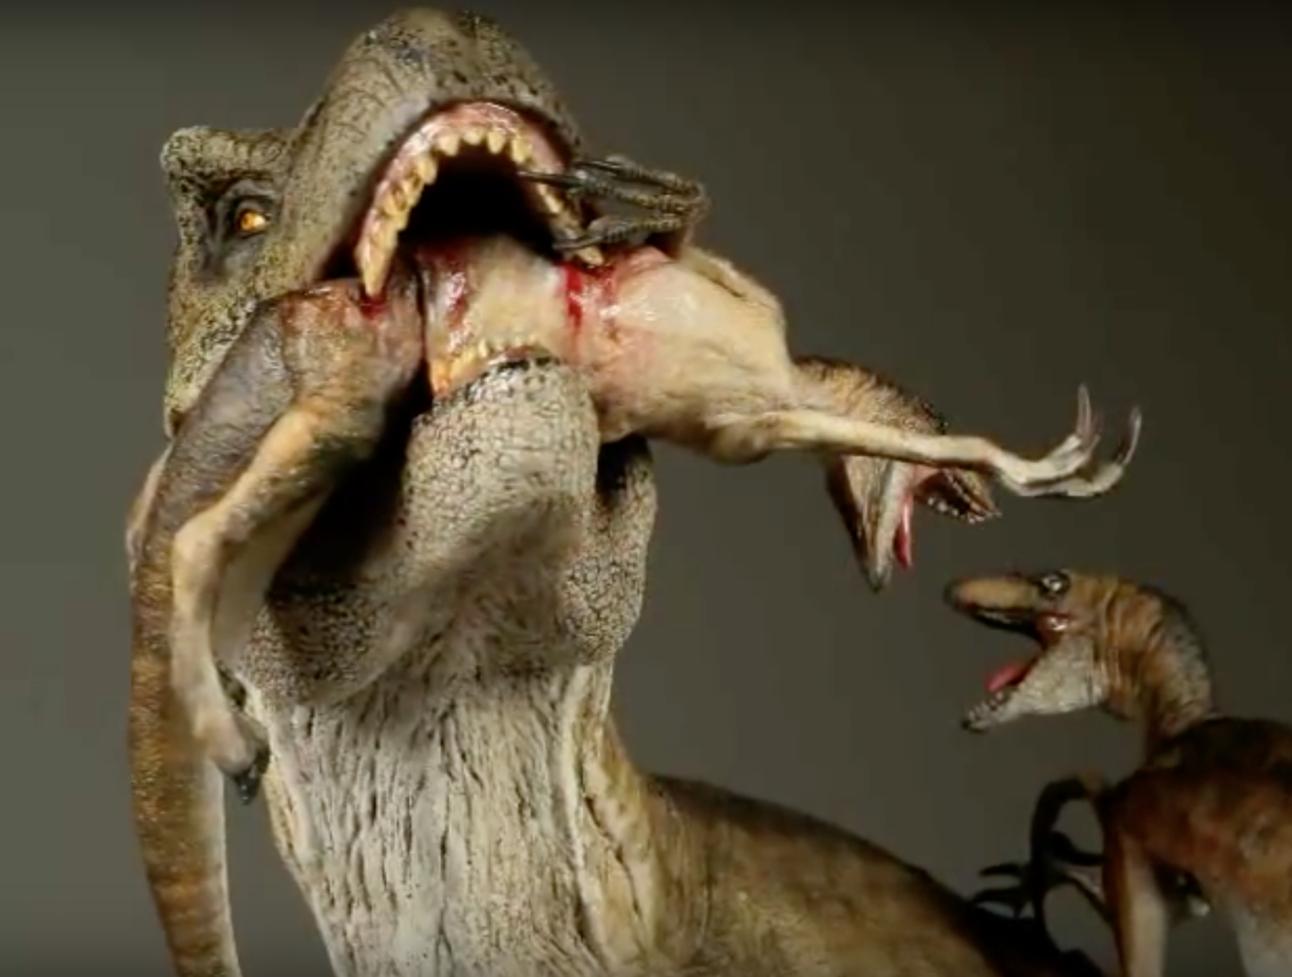 Jurassic Park T-Rex figure